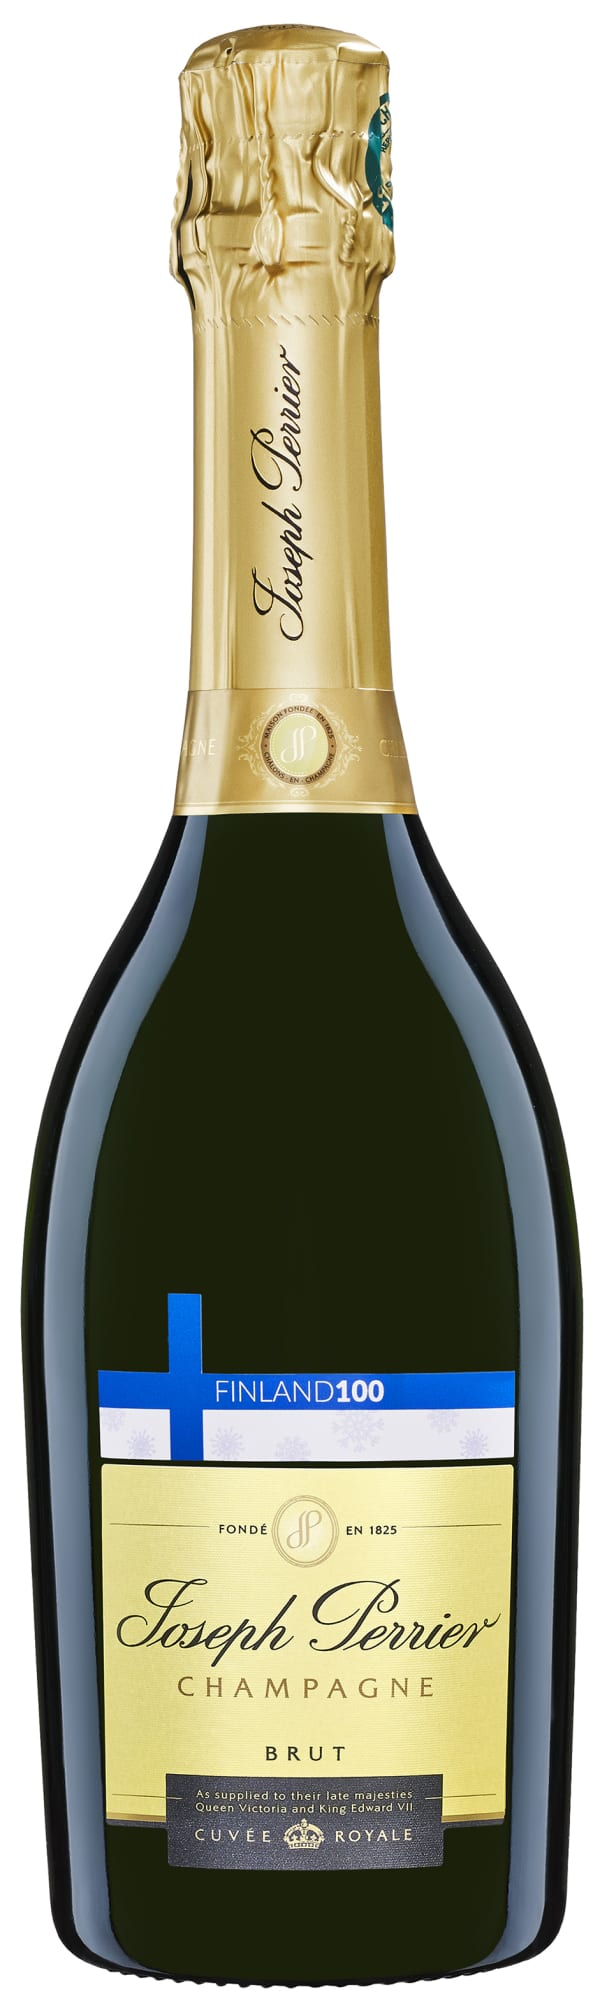 Joseph Perrier Cuvée Royale Finland 100 Champagne Brut